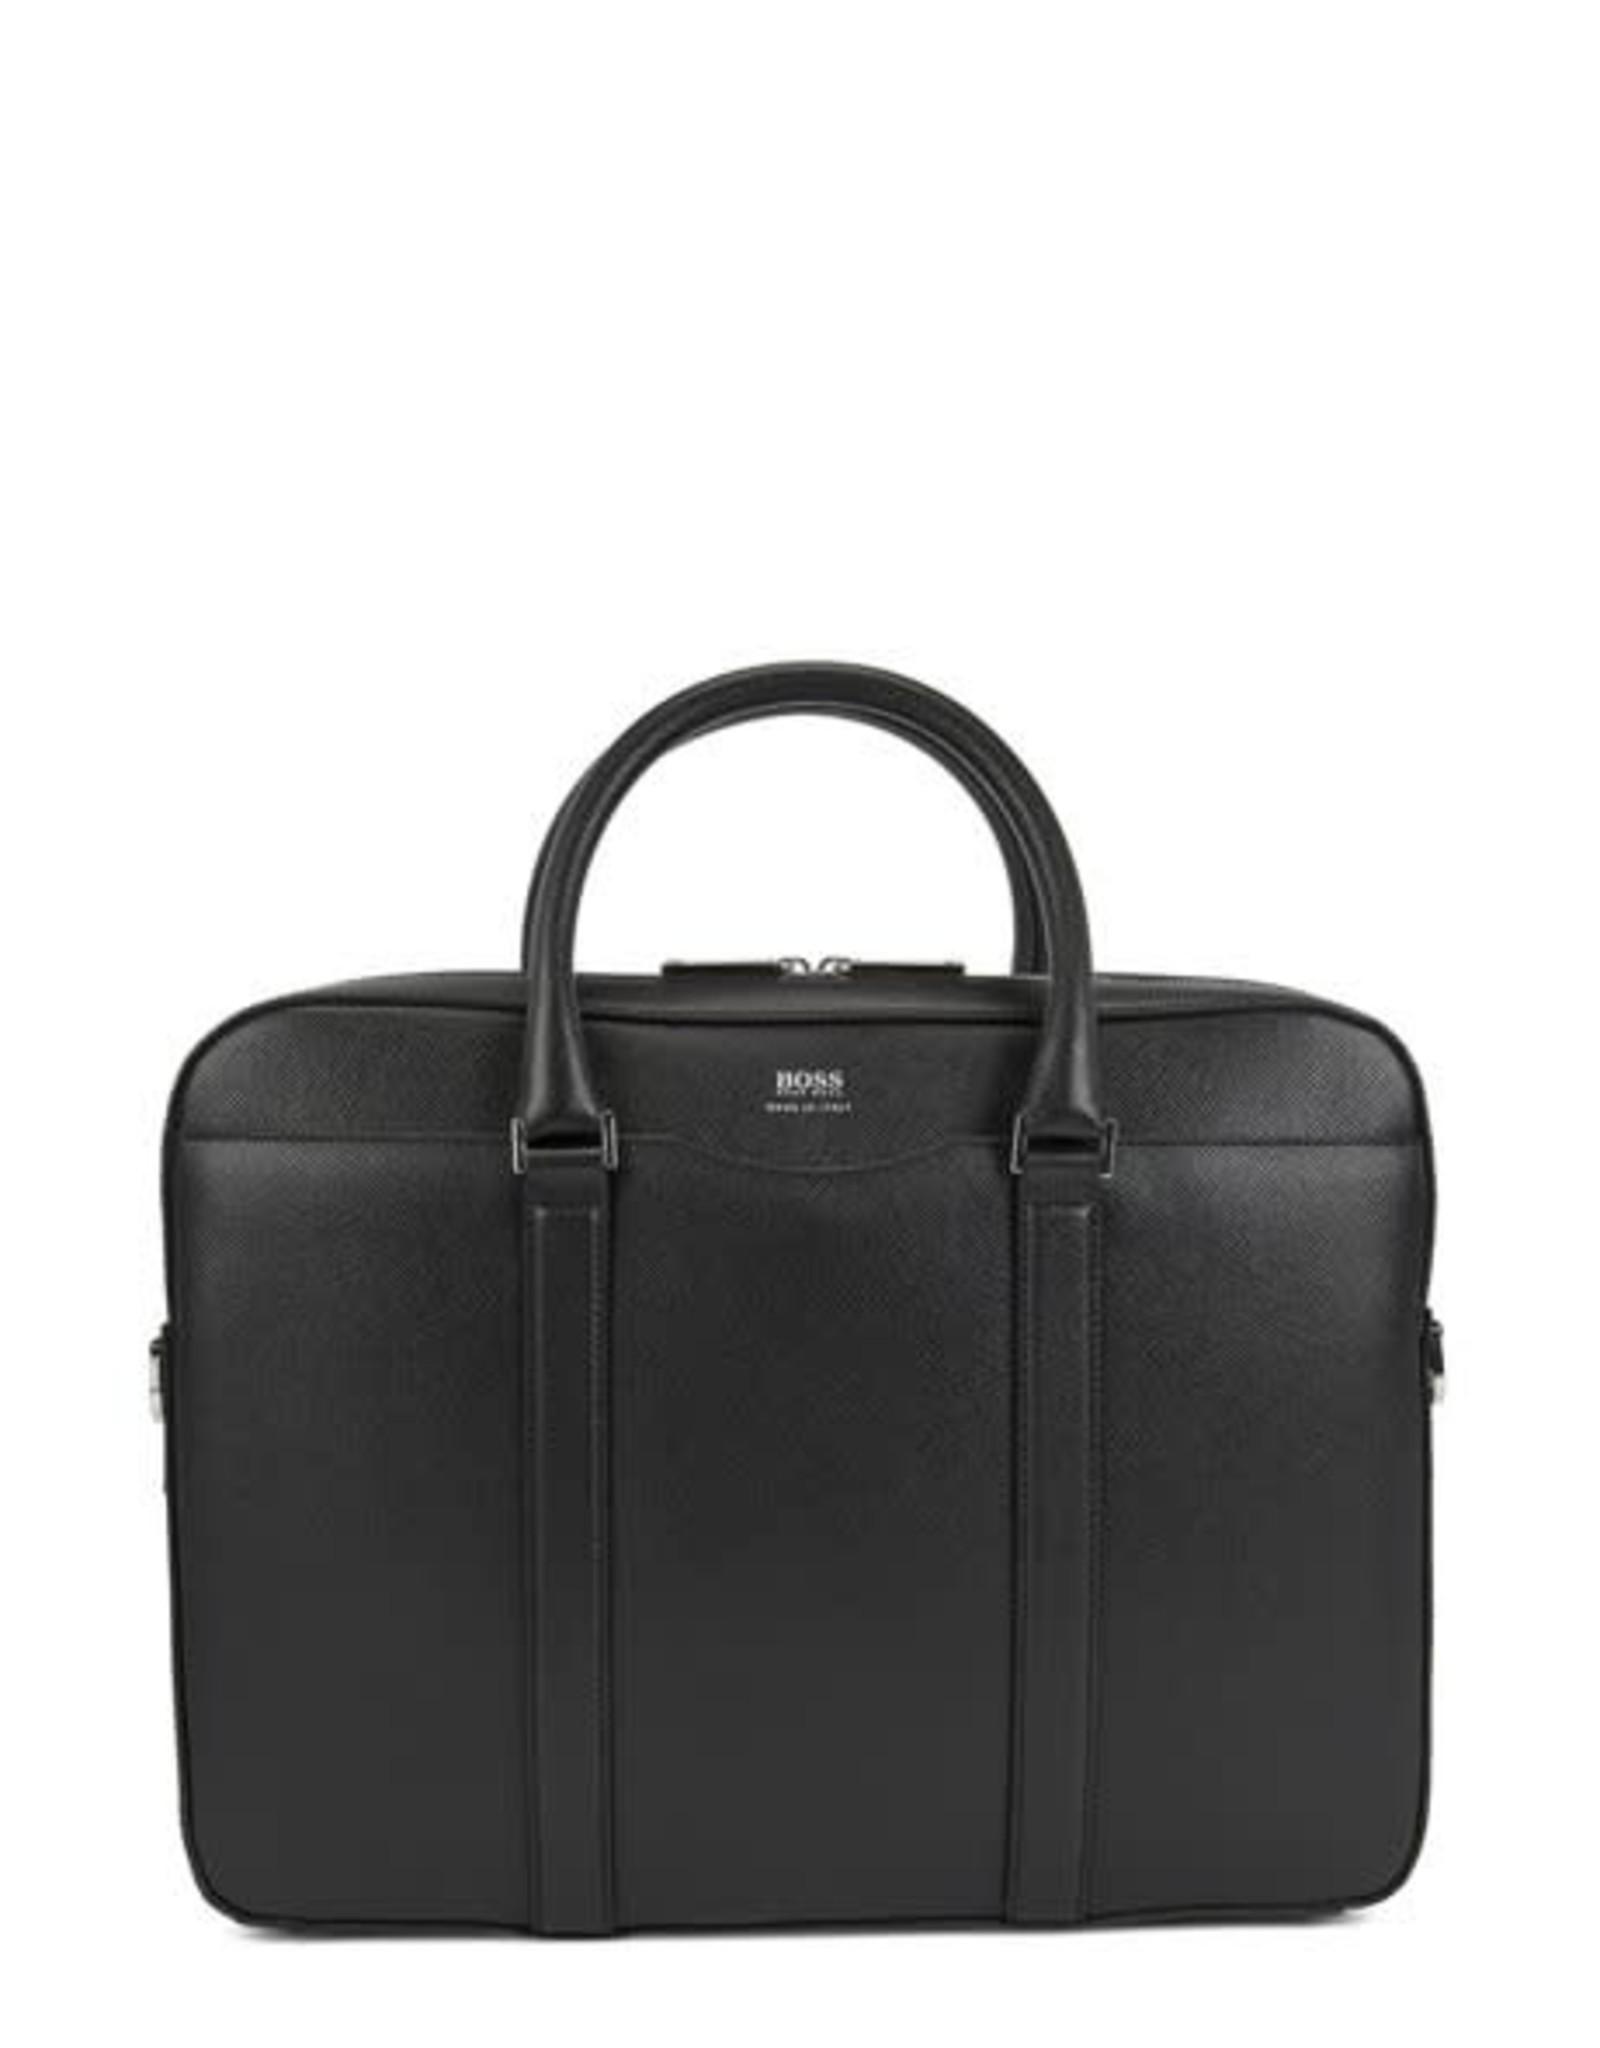 Hugo Boss Boss Leather Bag Signature